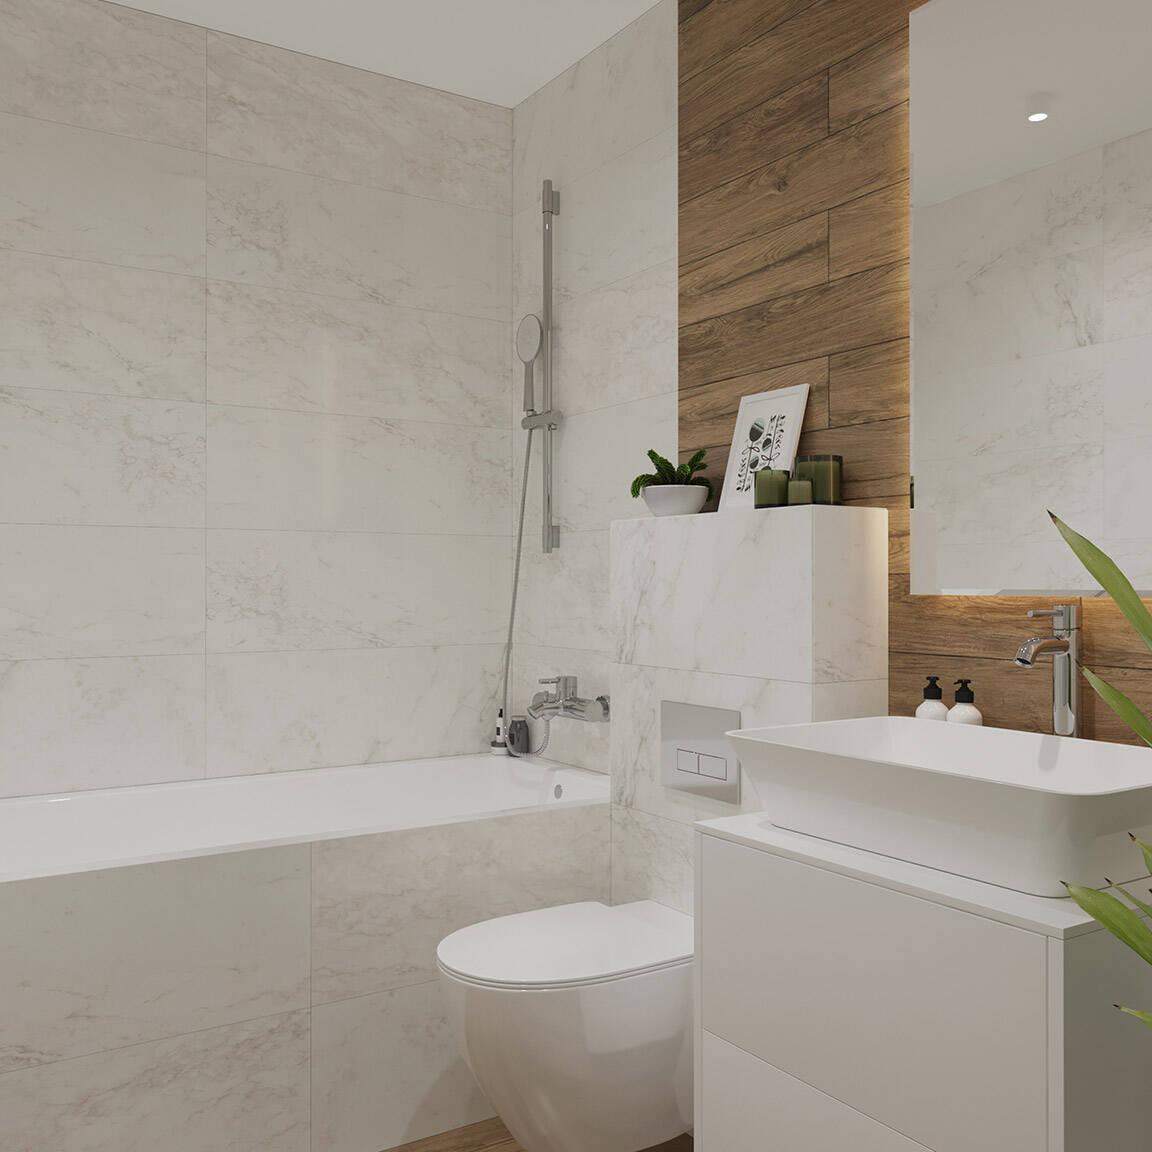 Catedral Residence - Bathroom - Marazzi Ceramic tiles - 5